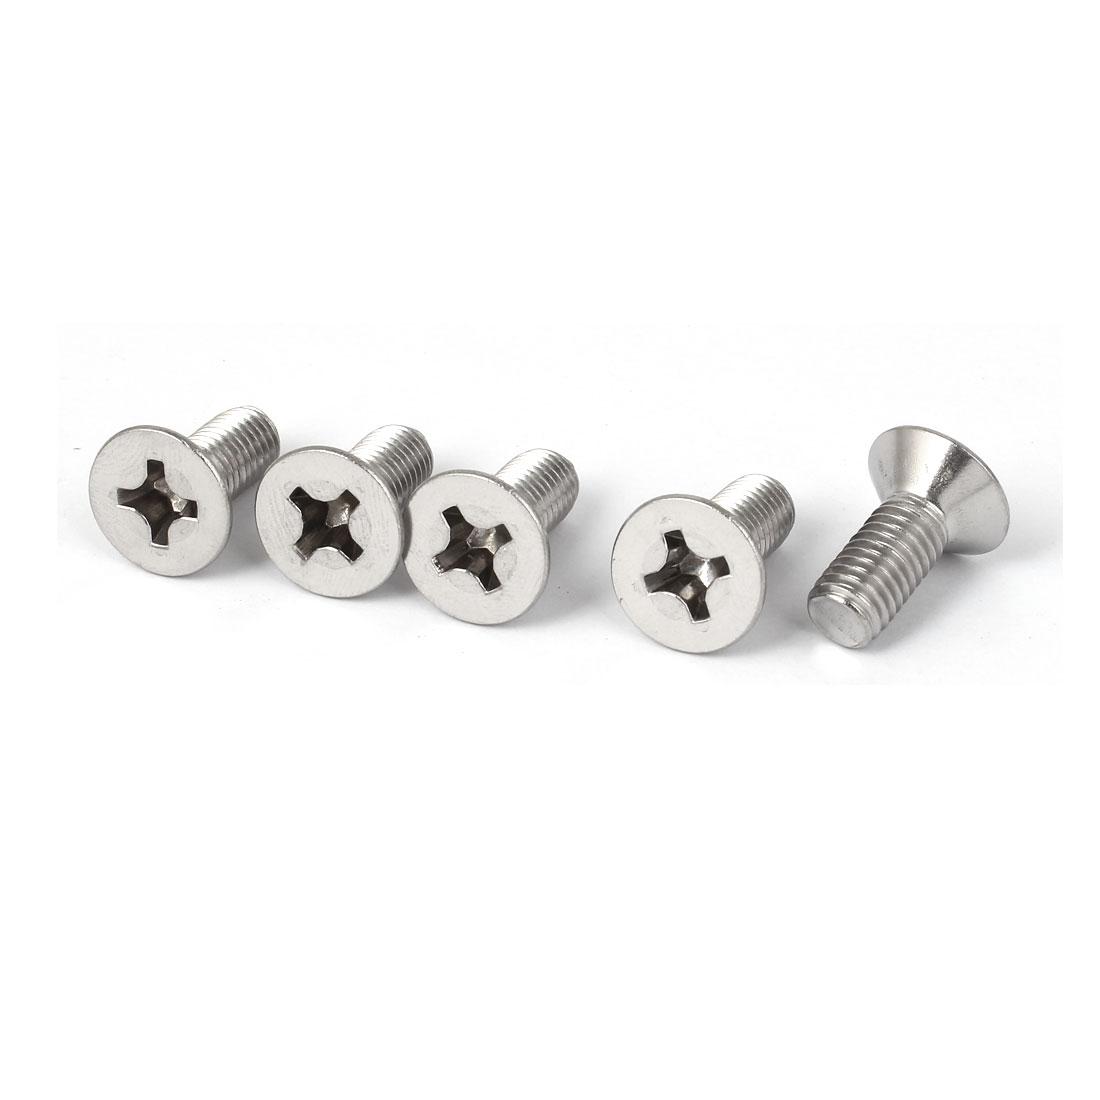 5 Pcs M8x20mm 316 Stainless Steel Flat Head Phillips Machine Screws Fasteners